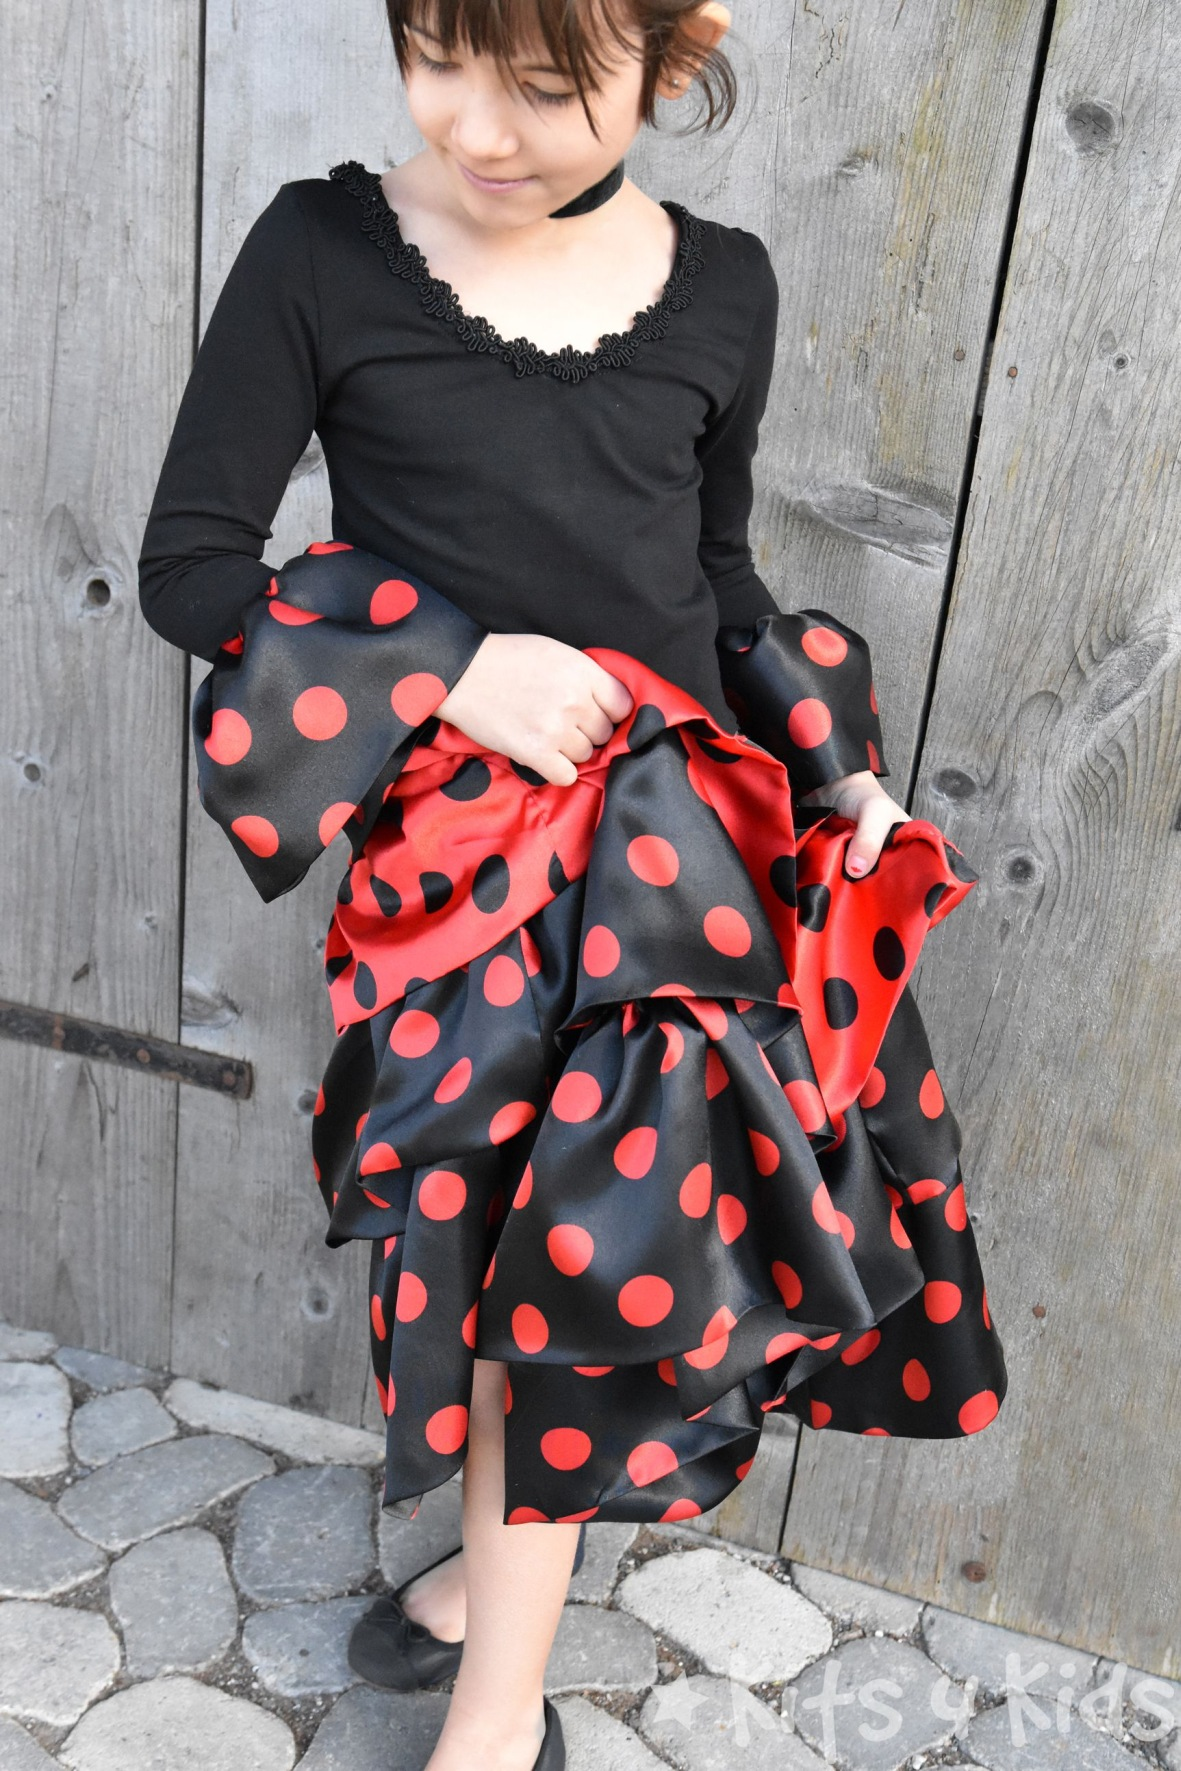 kits4kids: Flamencokleid nähen